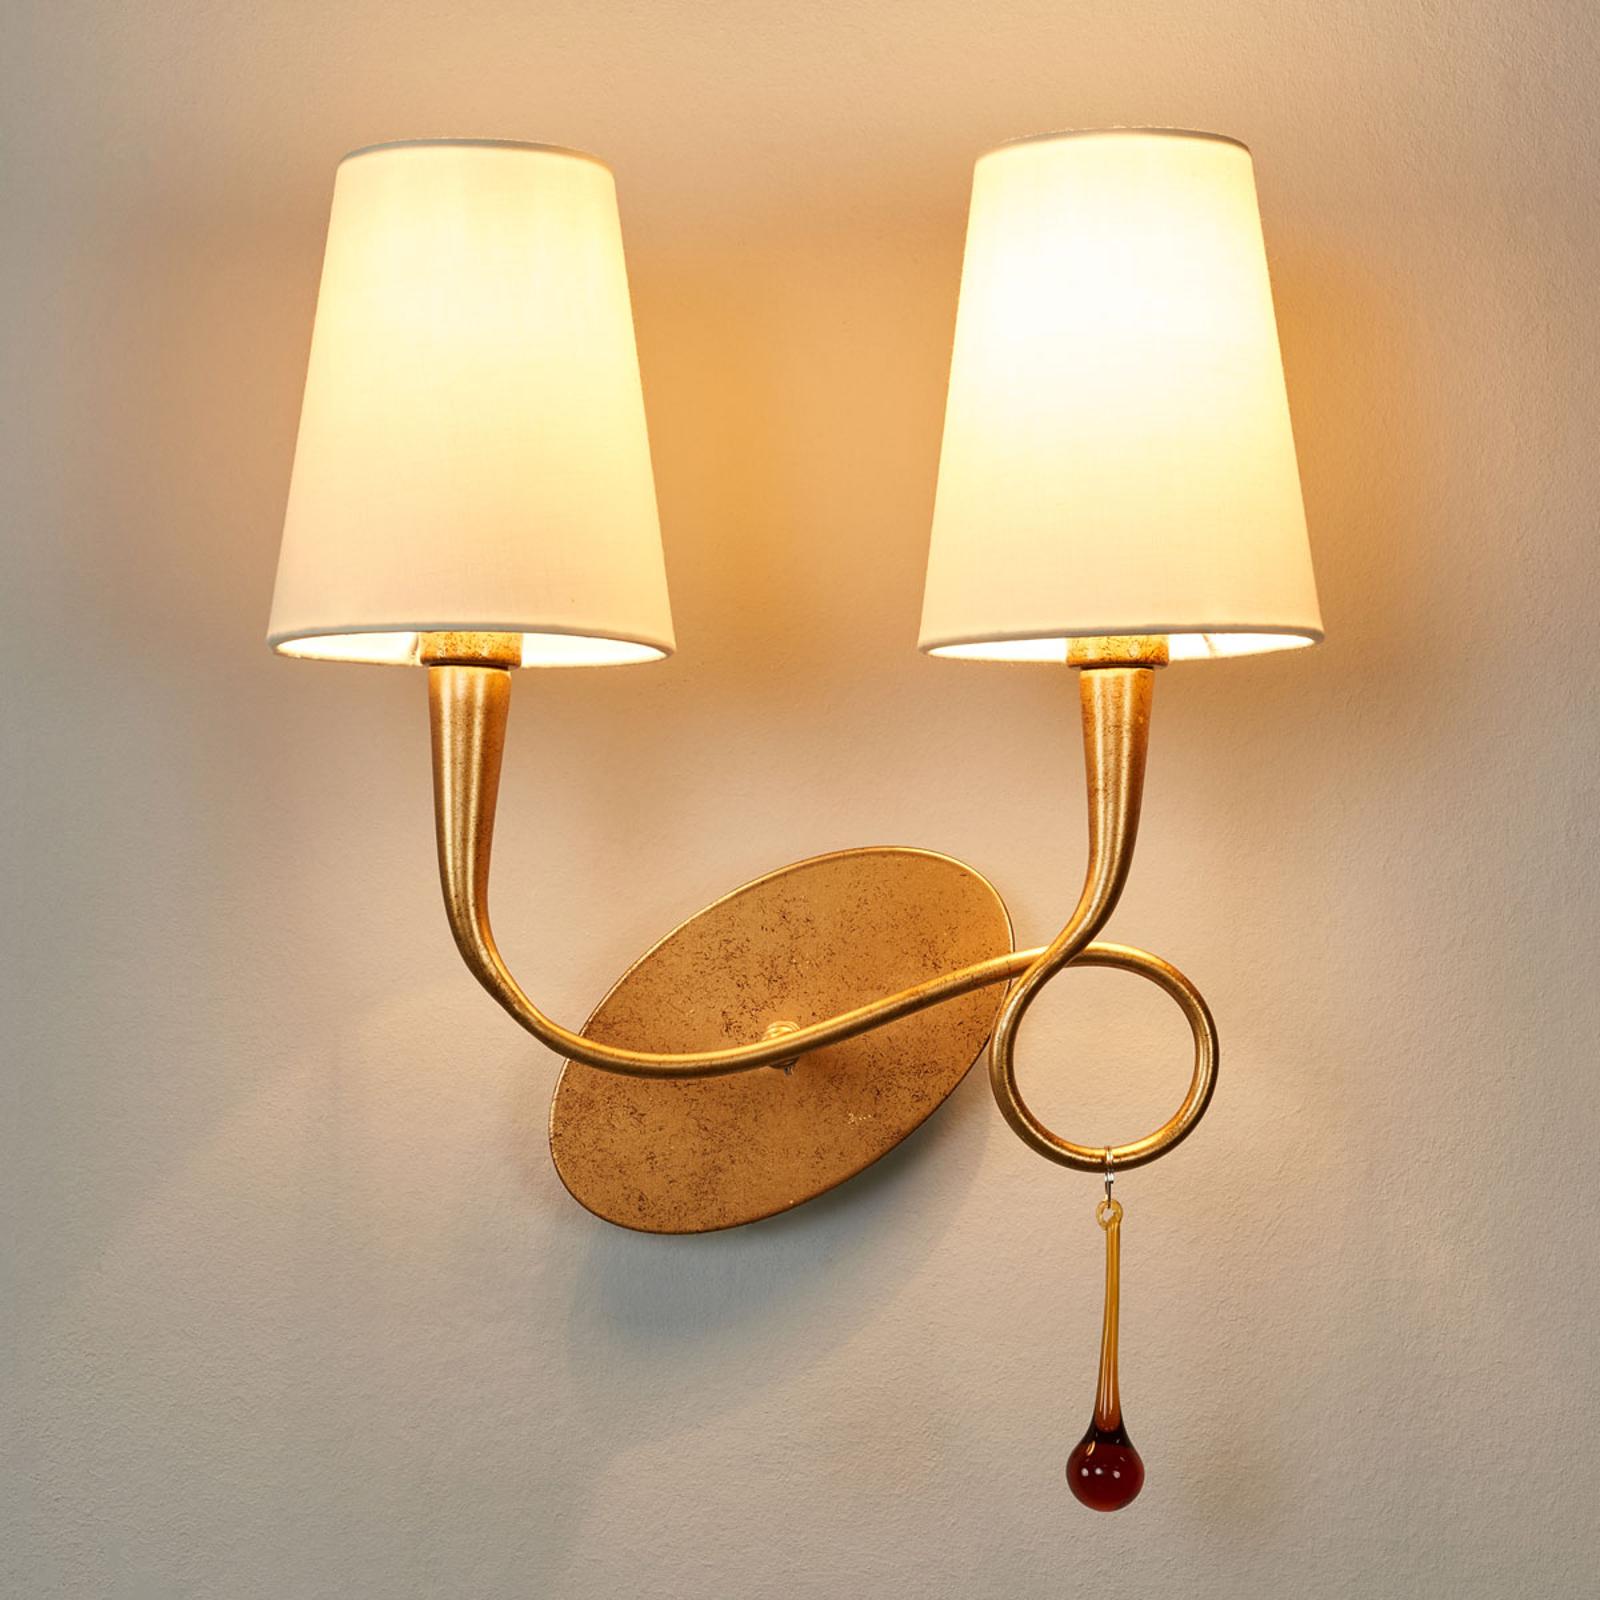 Gyllen vegglampe Paola med to lys